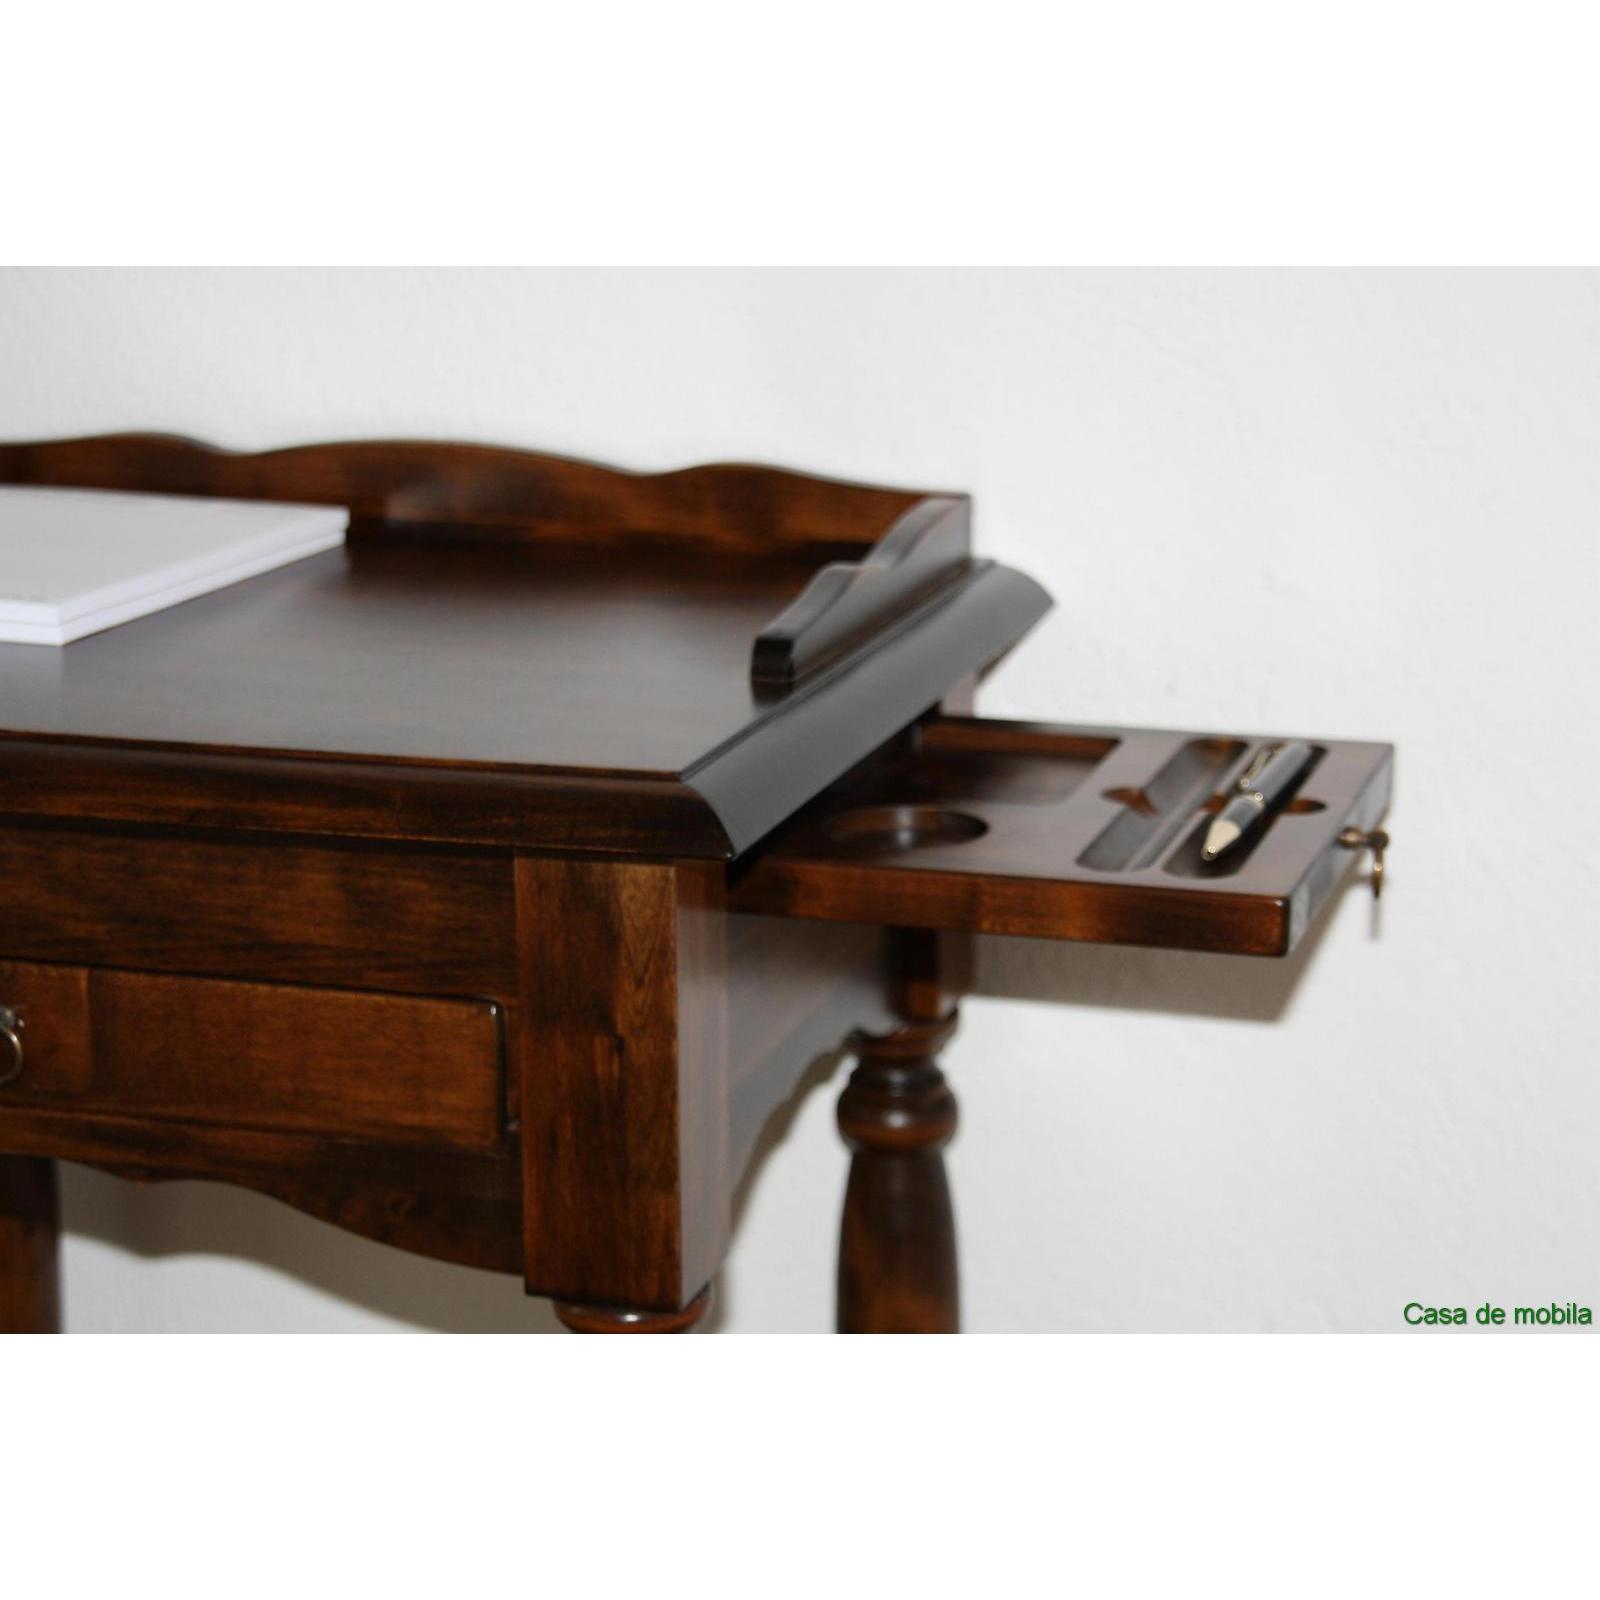 telefontisch telefonkonsole konsolentisch kolonial braun. Black Bedroom Furniture Sets. Home Design Ideas